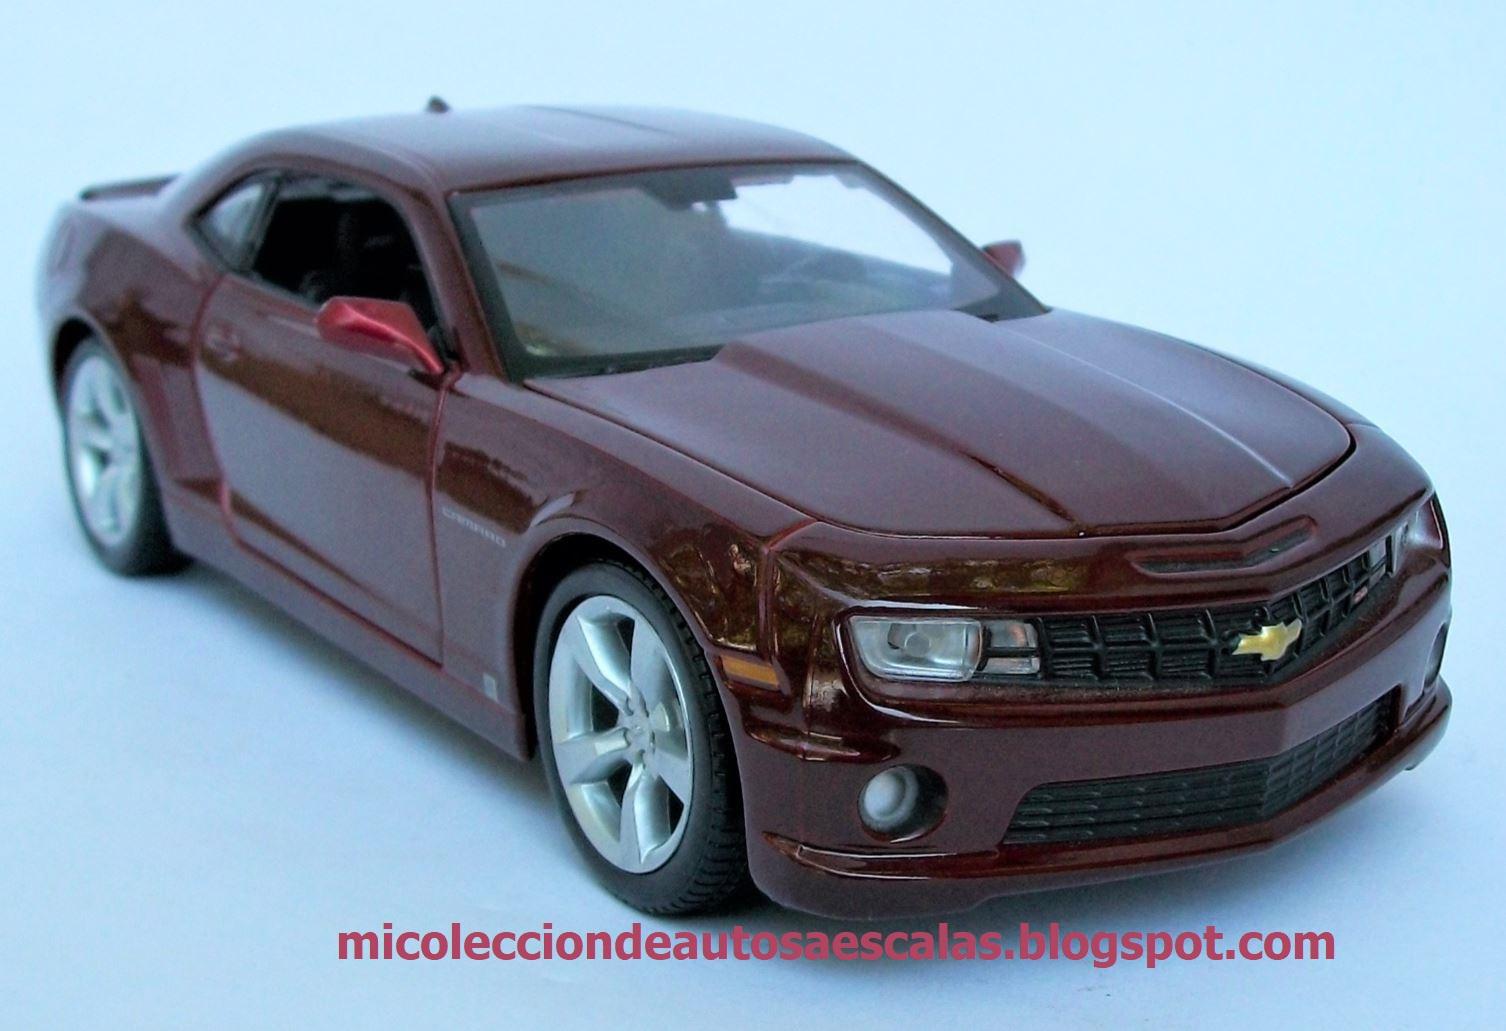 2010 Chevrolet Camaro Ss Rs 1 24 Maisto